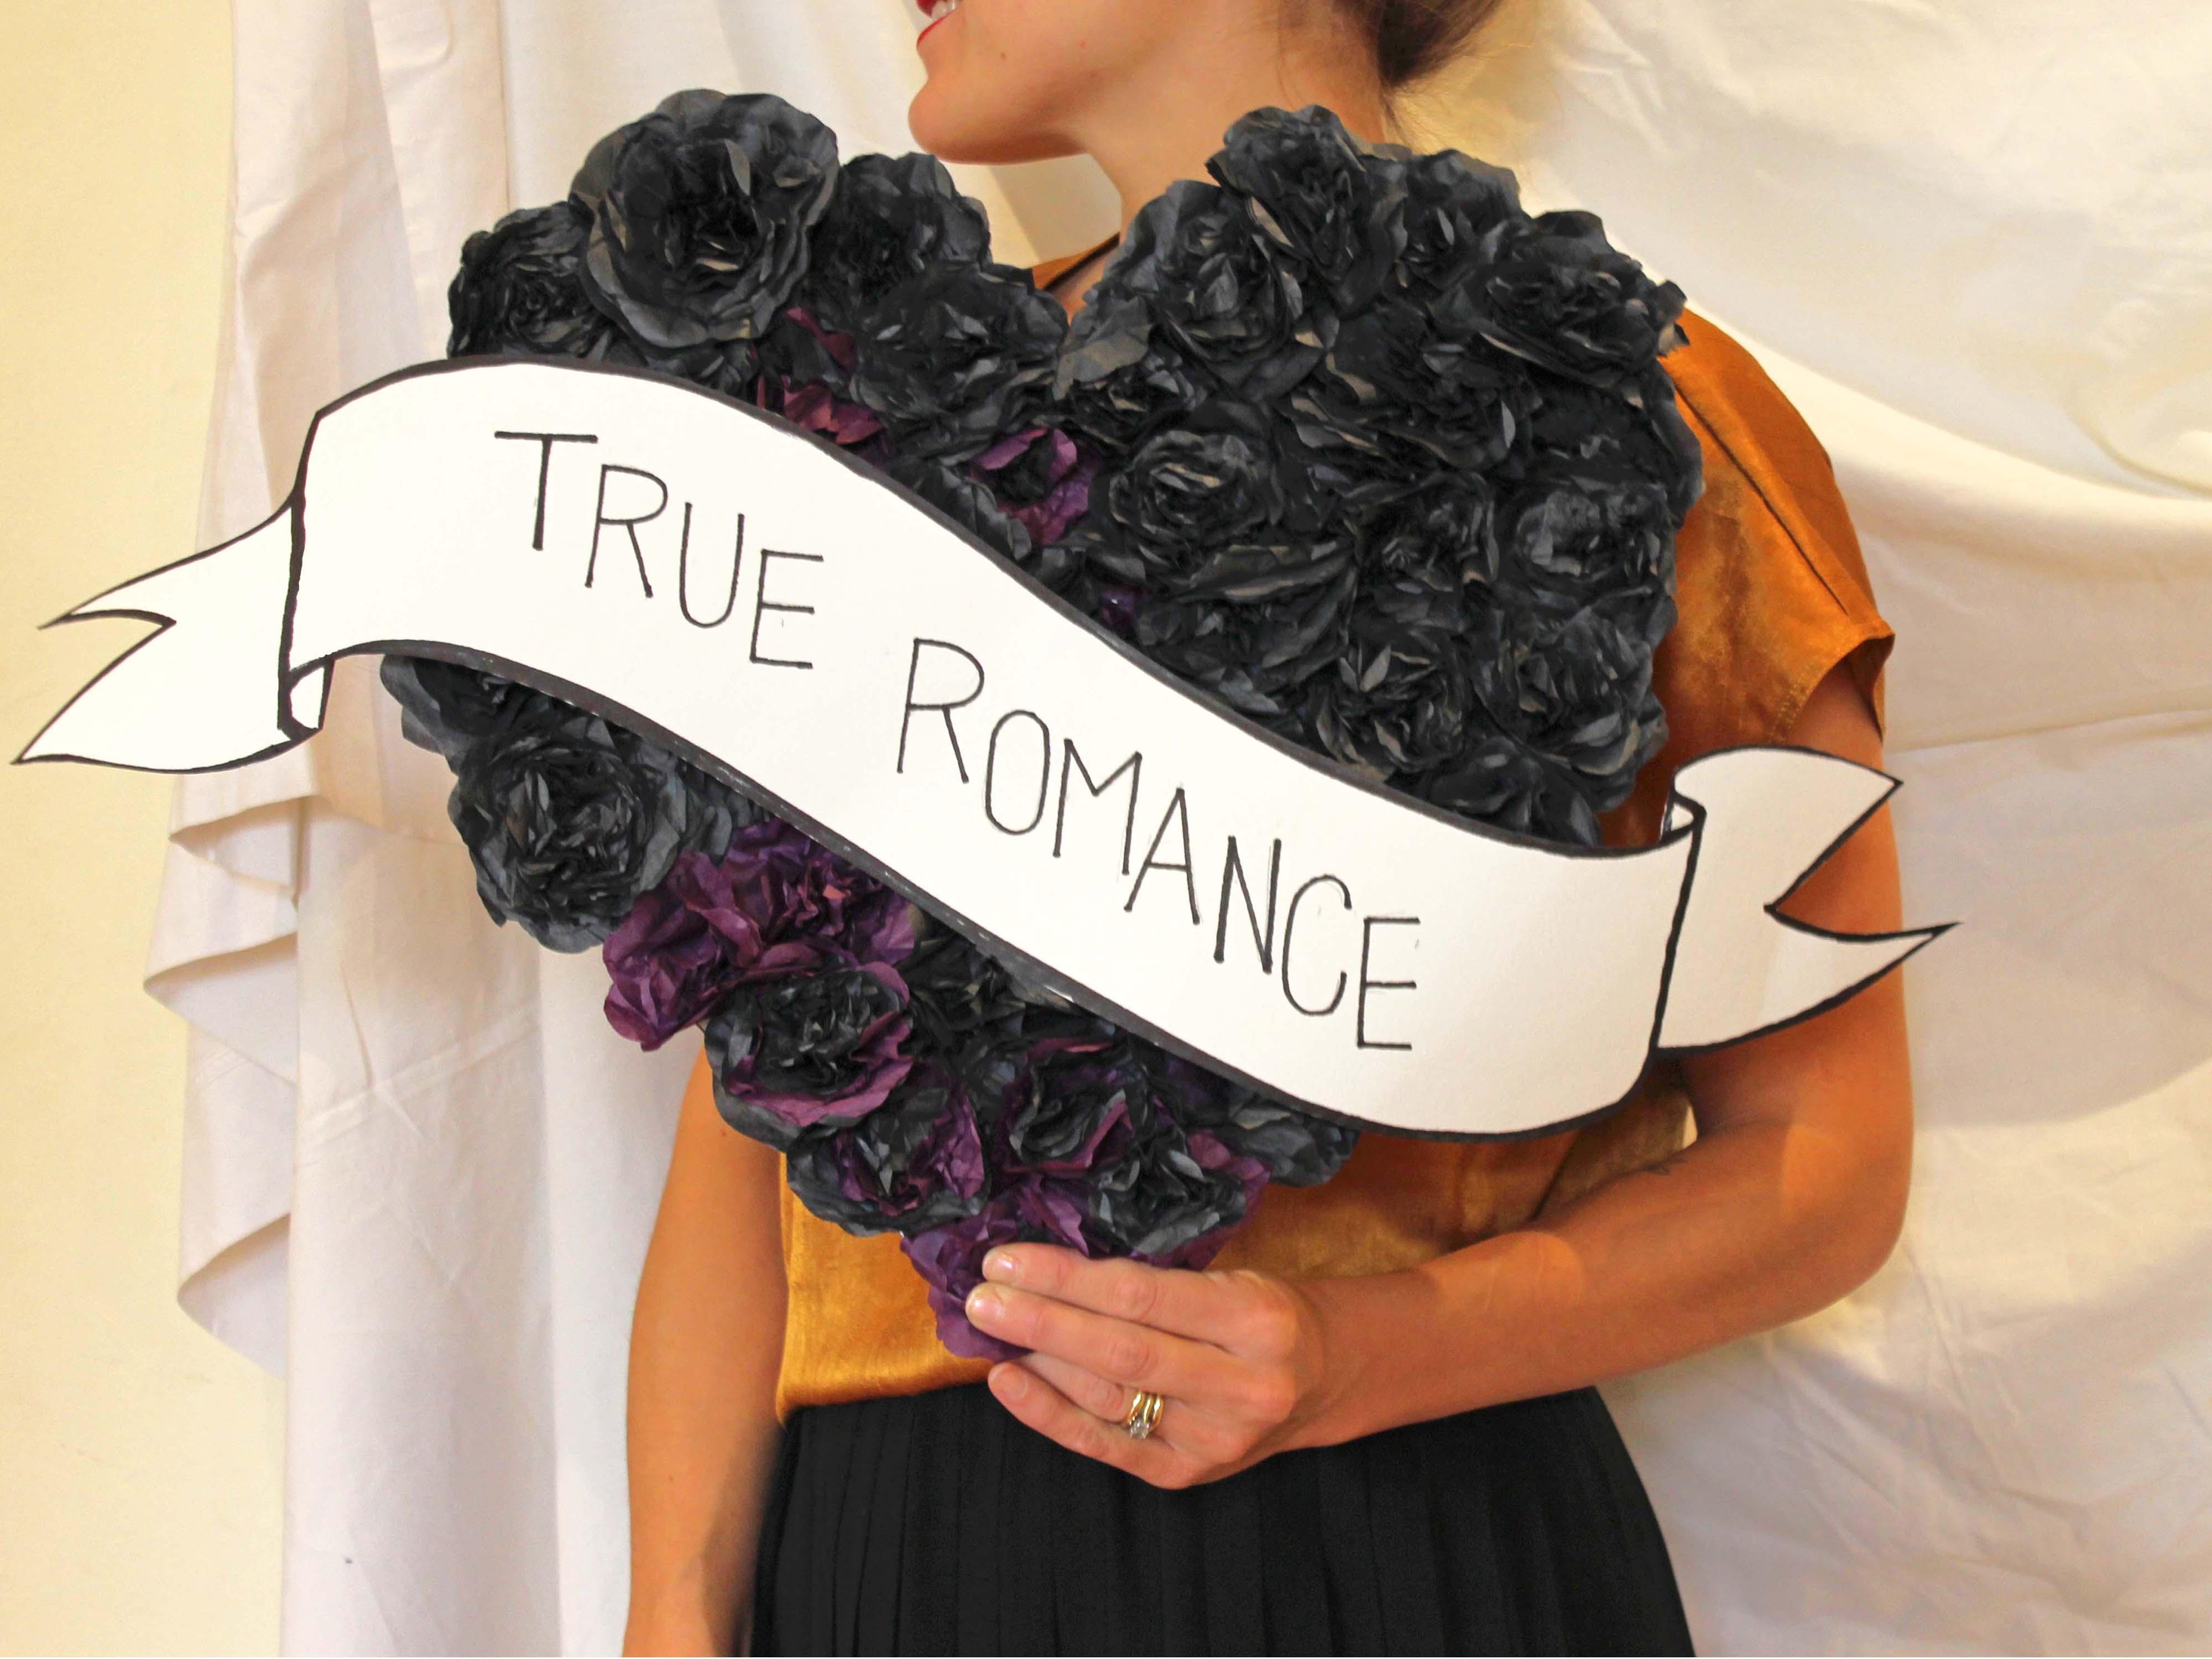 True love dating site